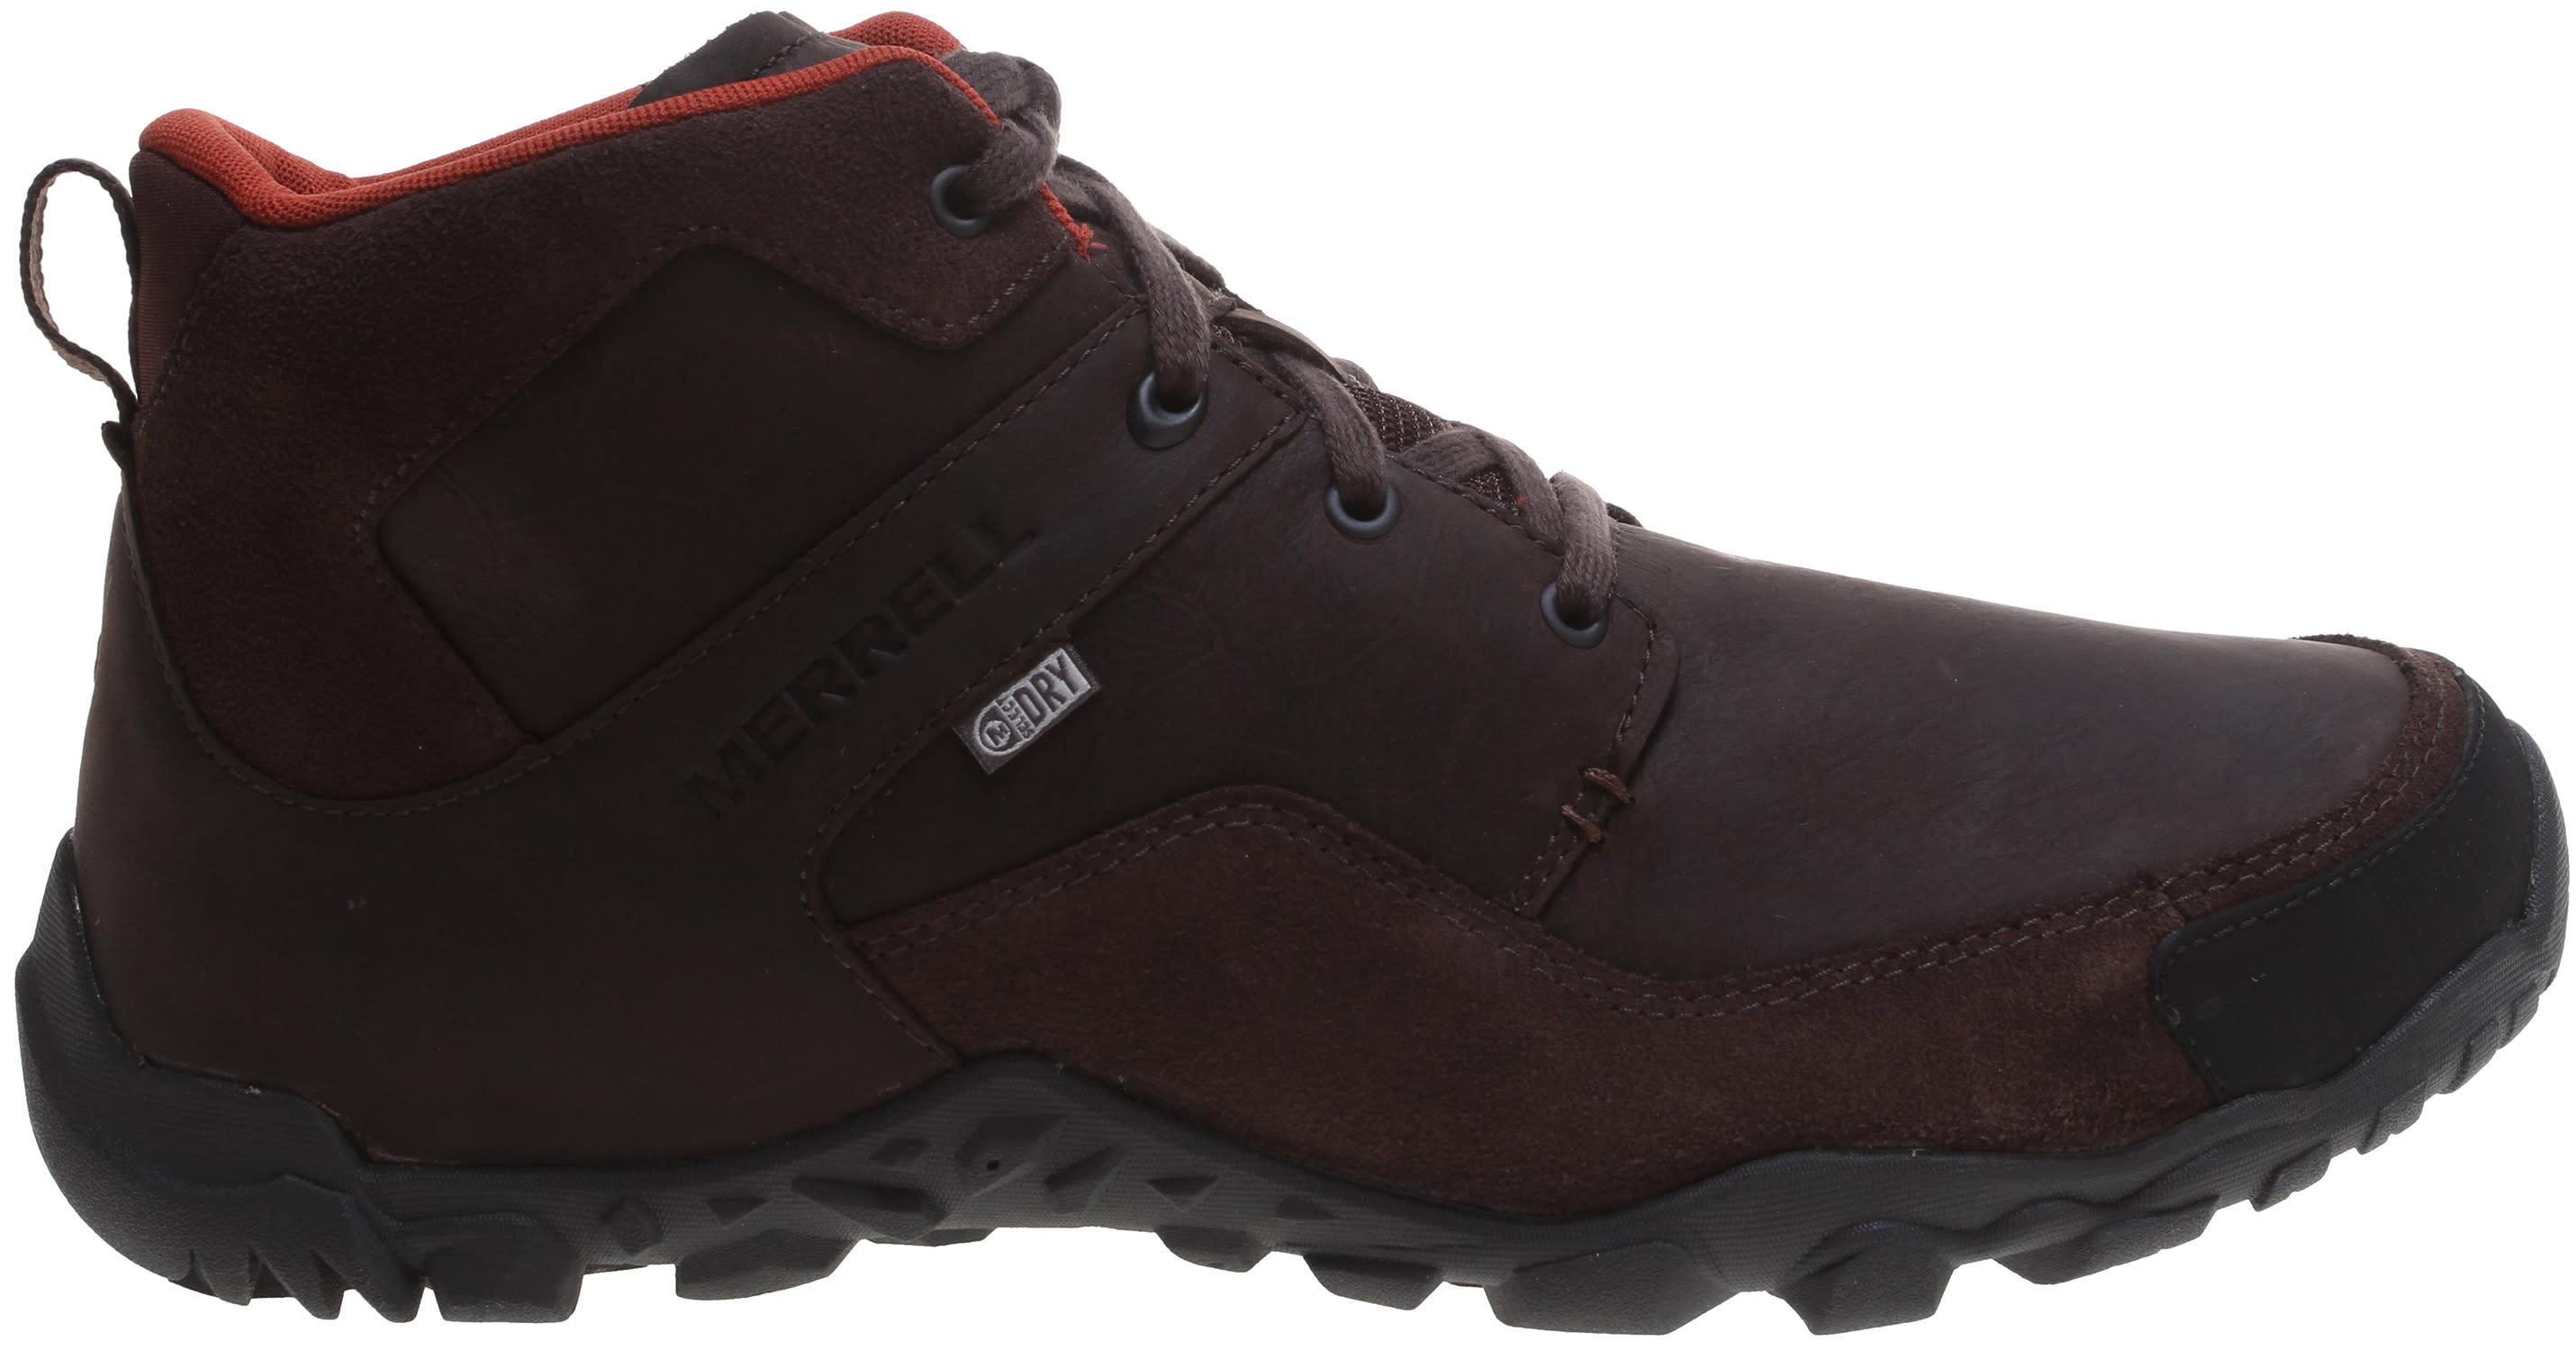 Merrell Telluride Mid Waterproof Boots - thumbnail 1